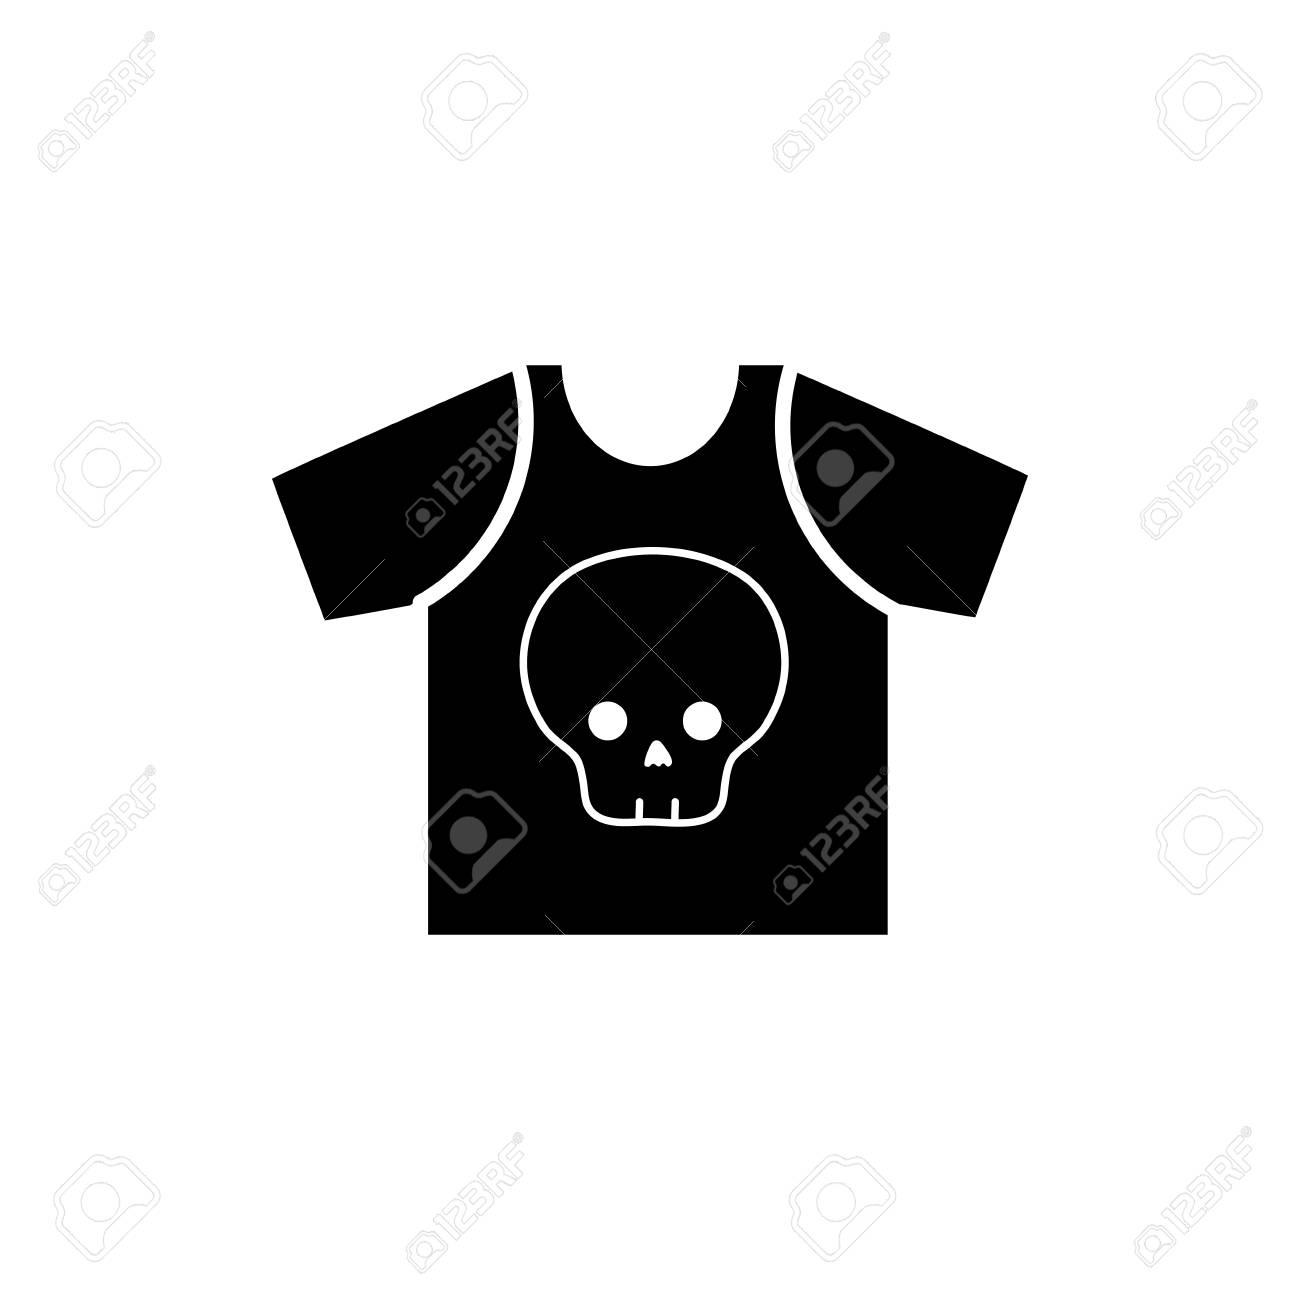 Contour Rock T Shirt With Skull Design Casul Clothes Vector